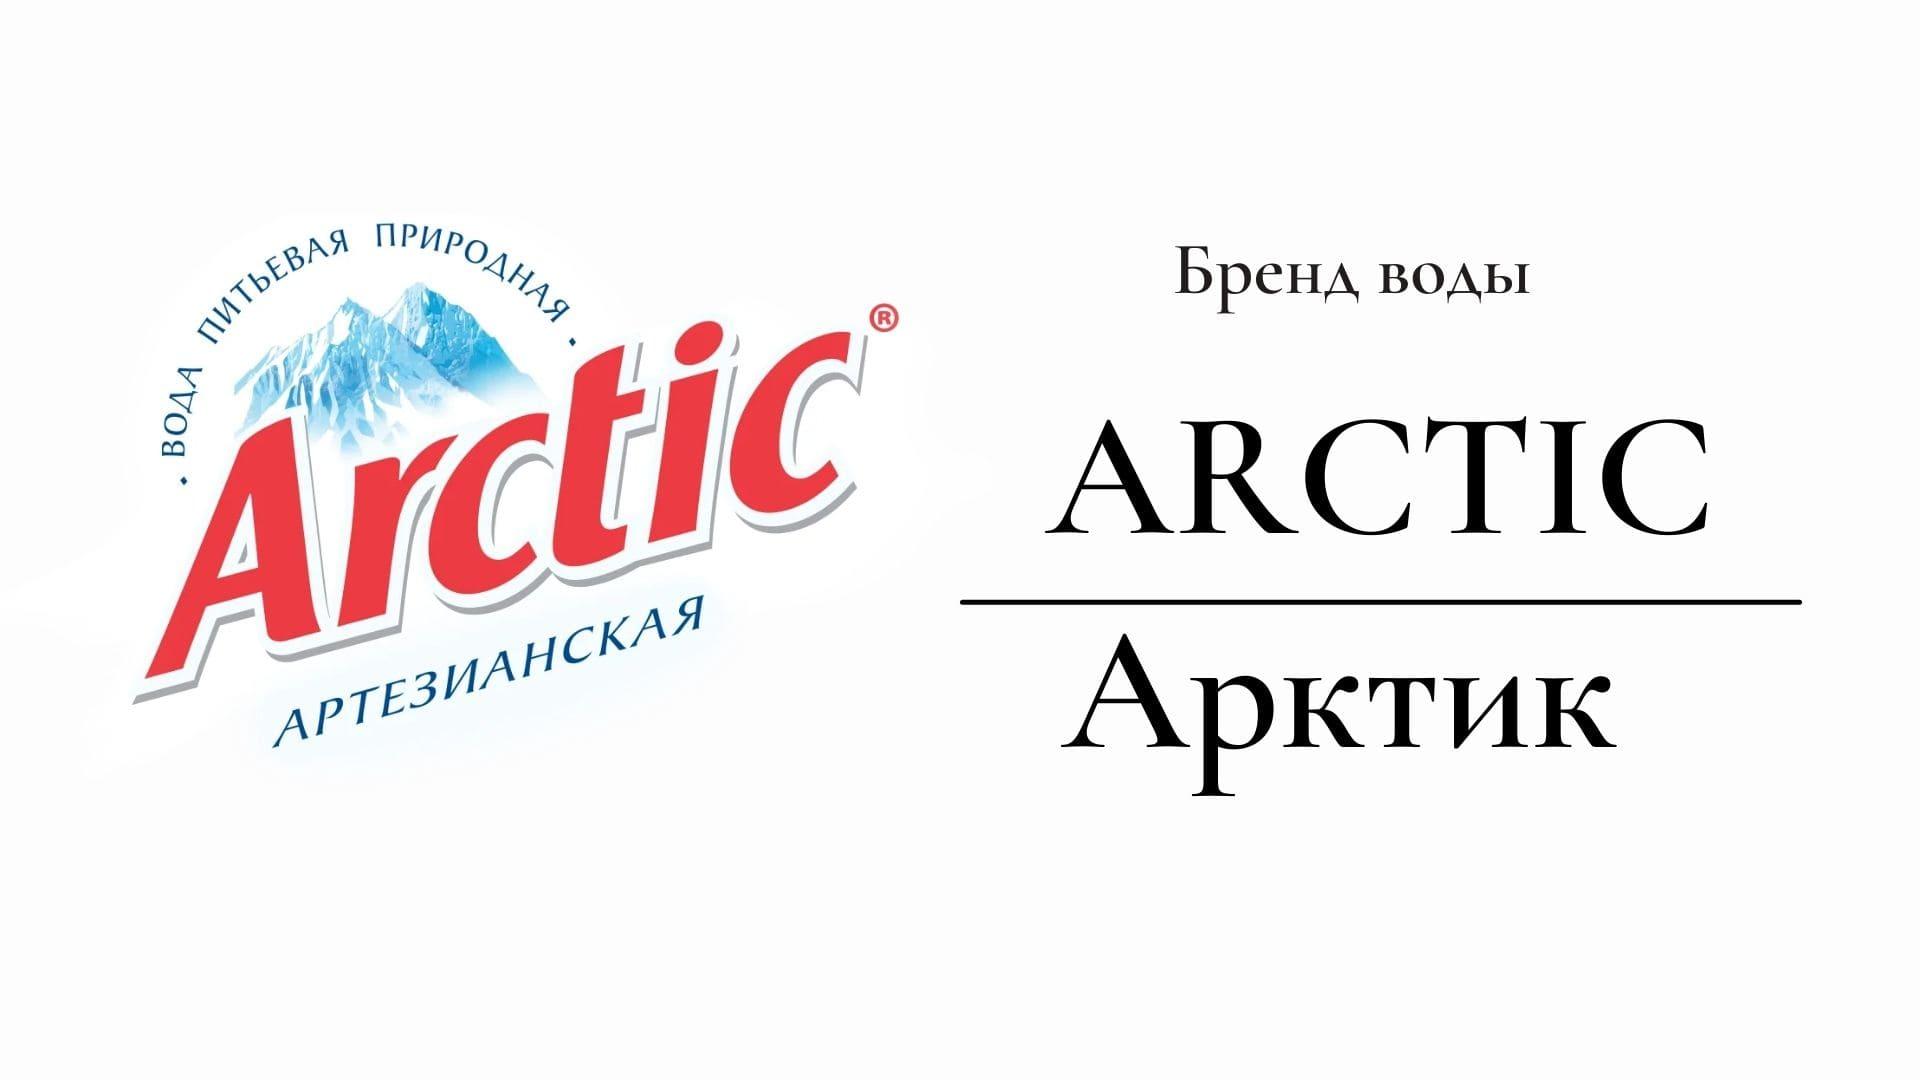 Бренд Арктик логотип